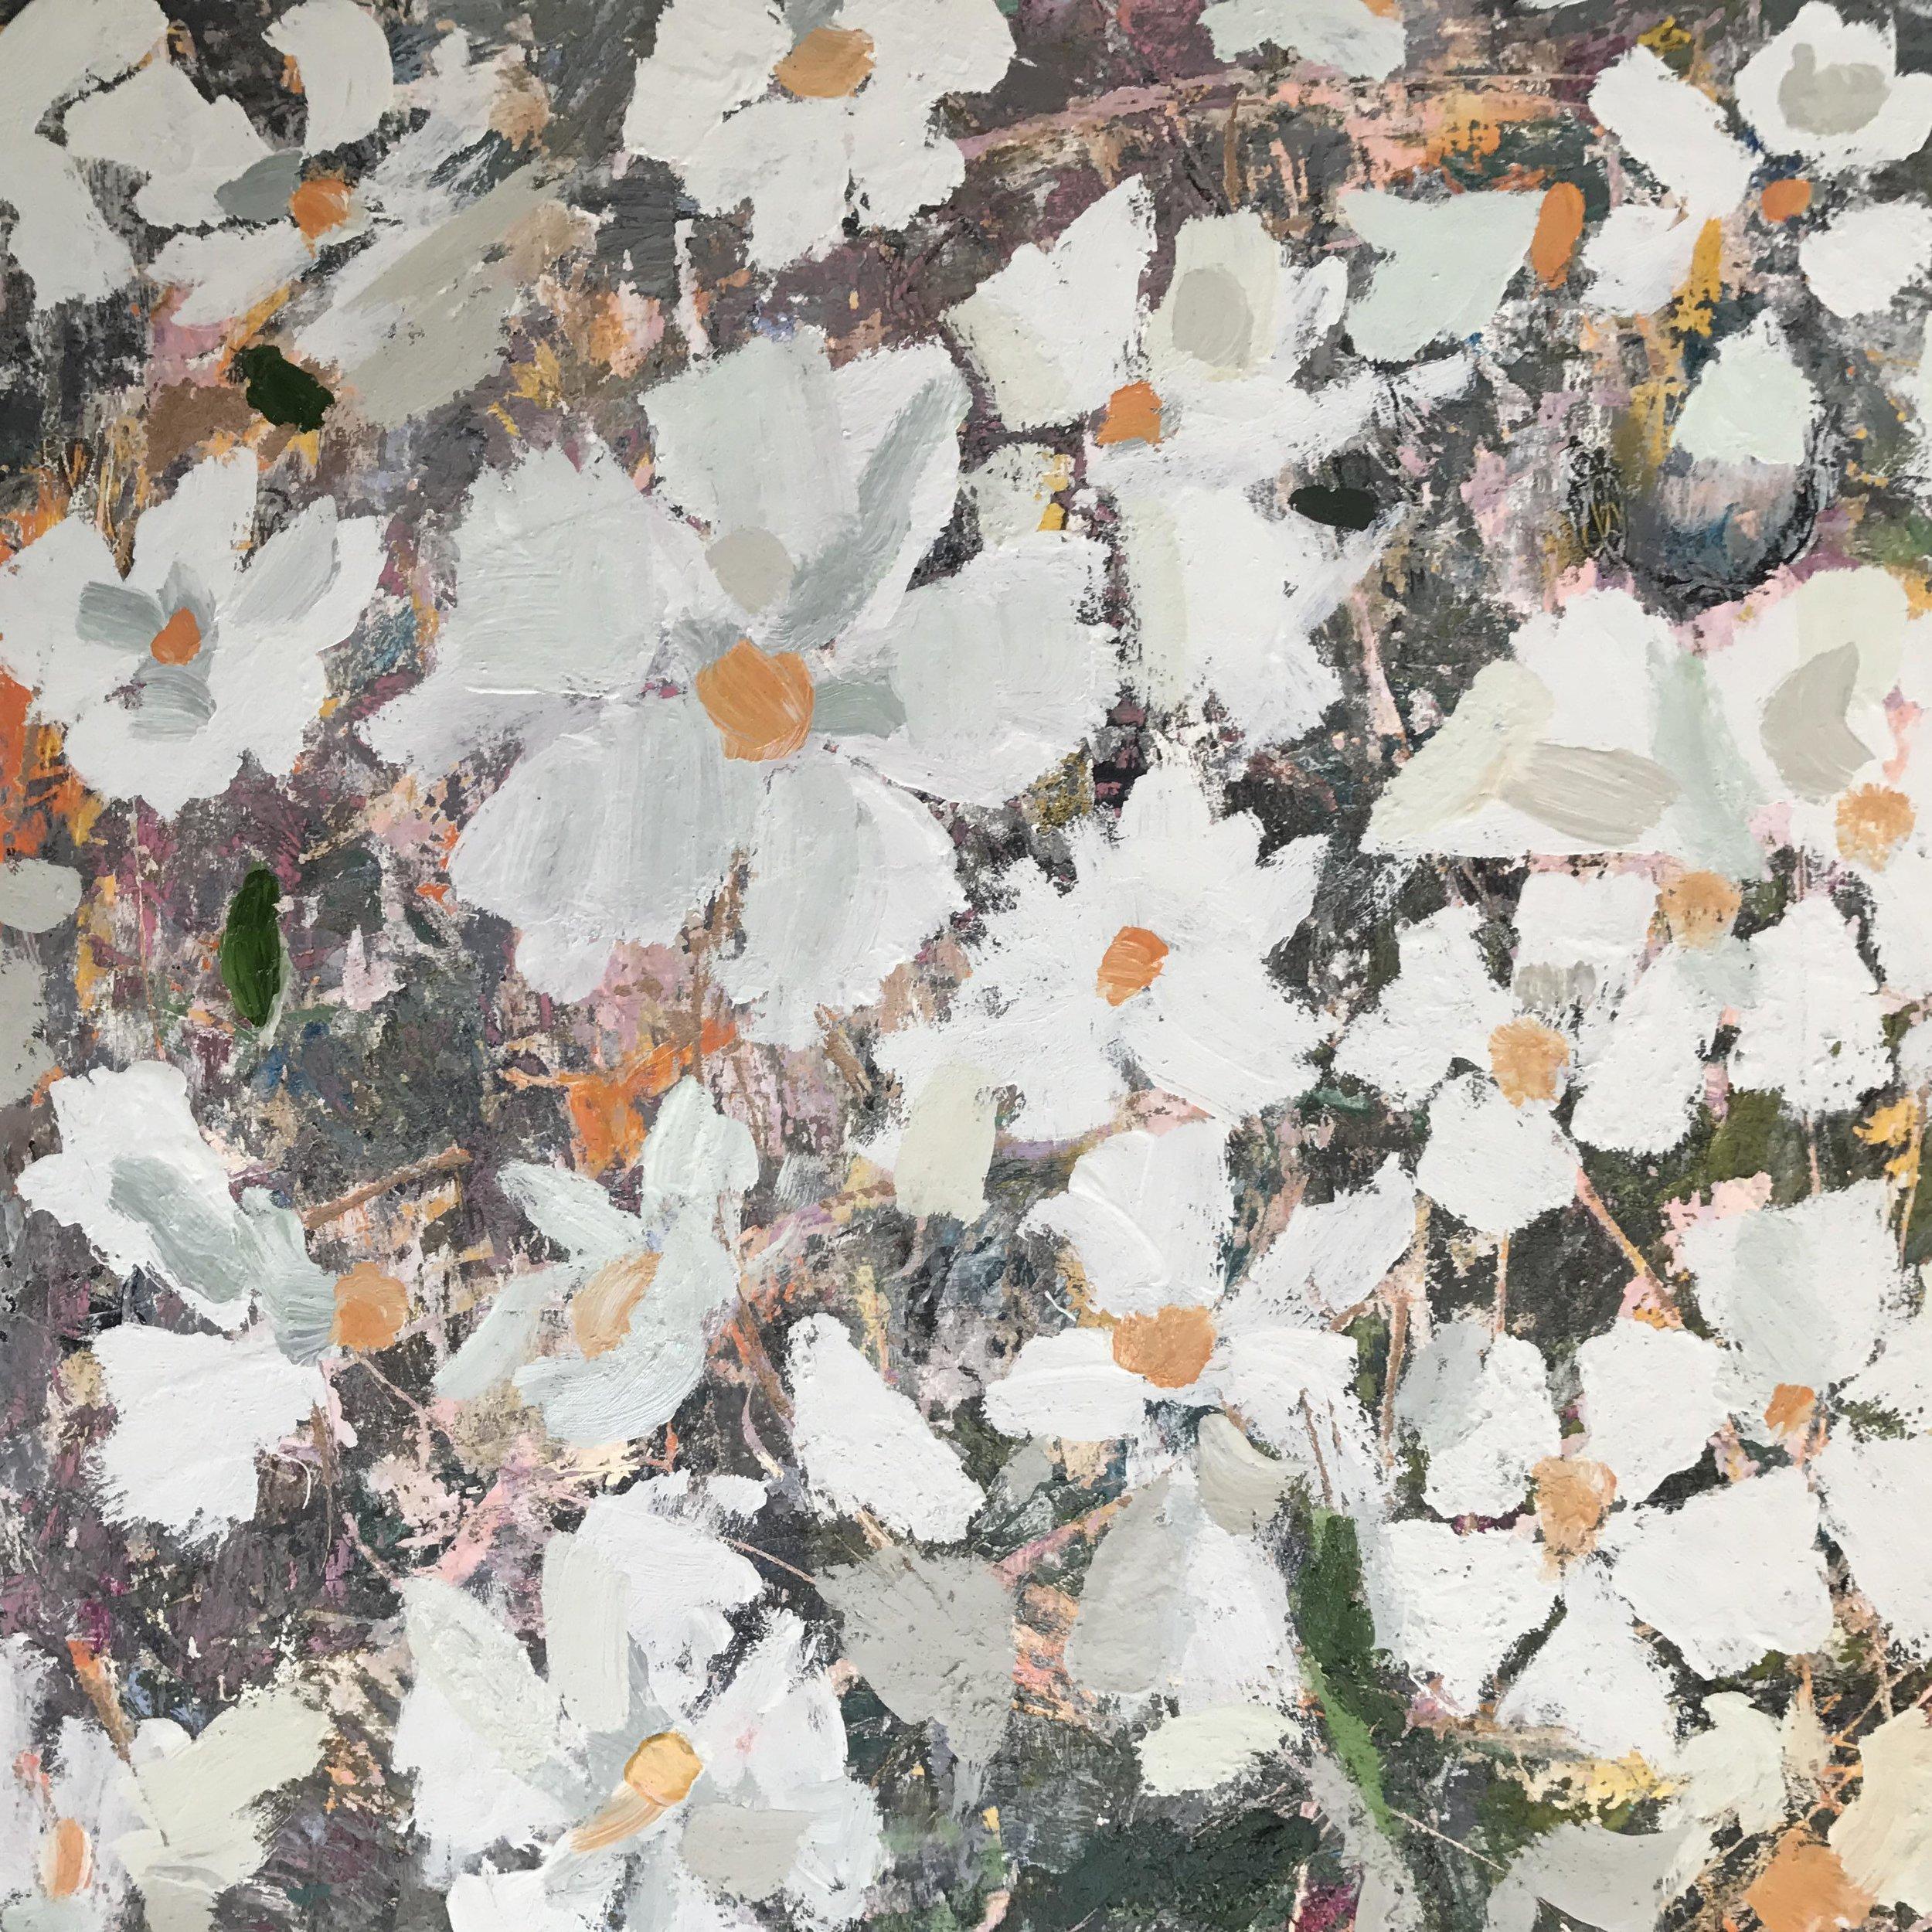 Lucy Zaroyko                 Fallen Rotten Blooming - 8 September - 30 September 2017